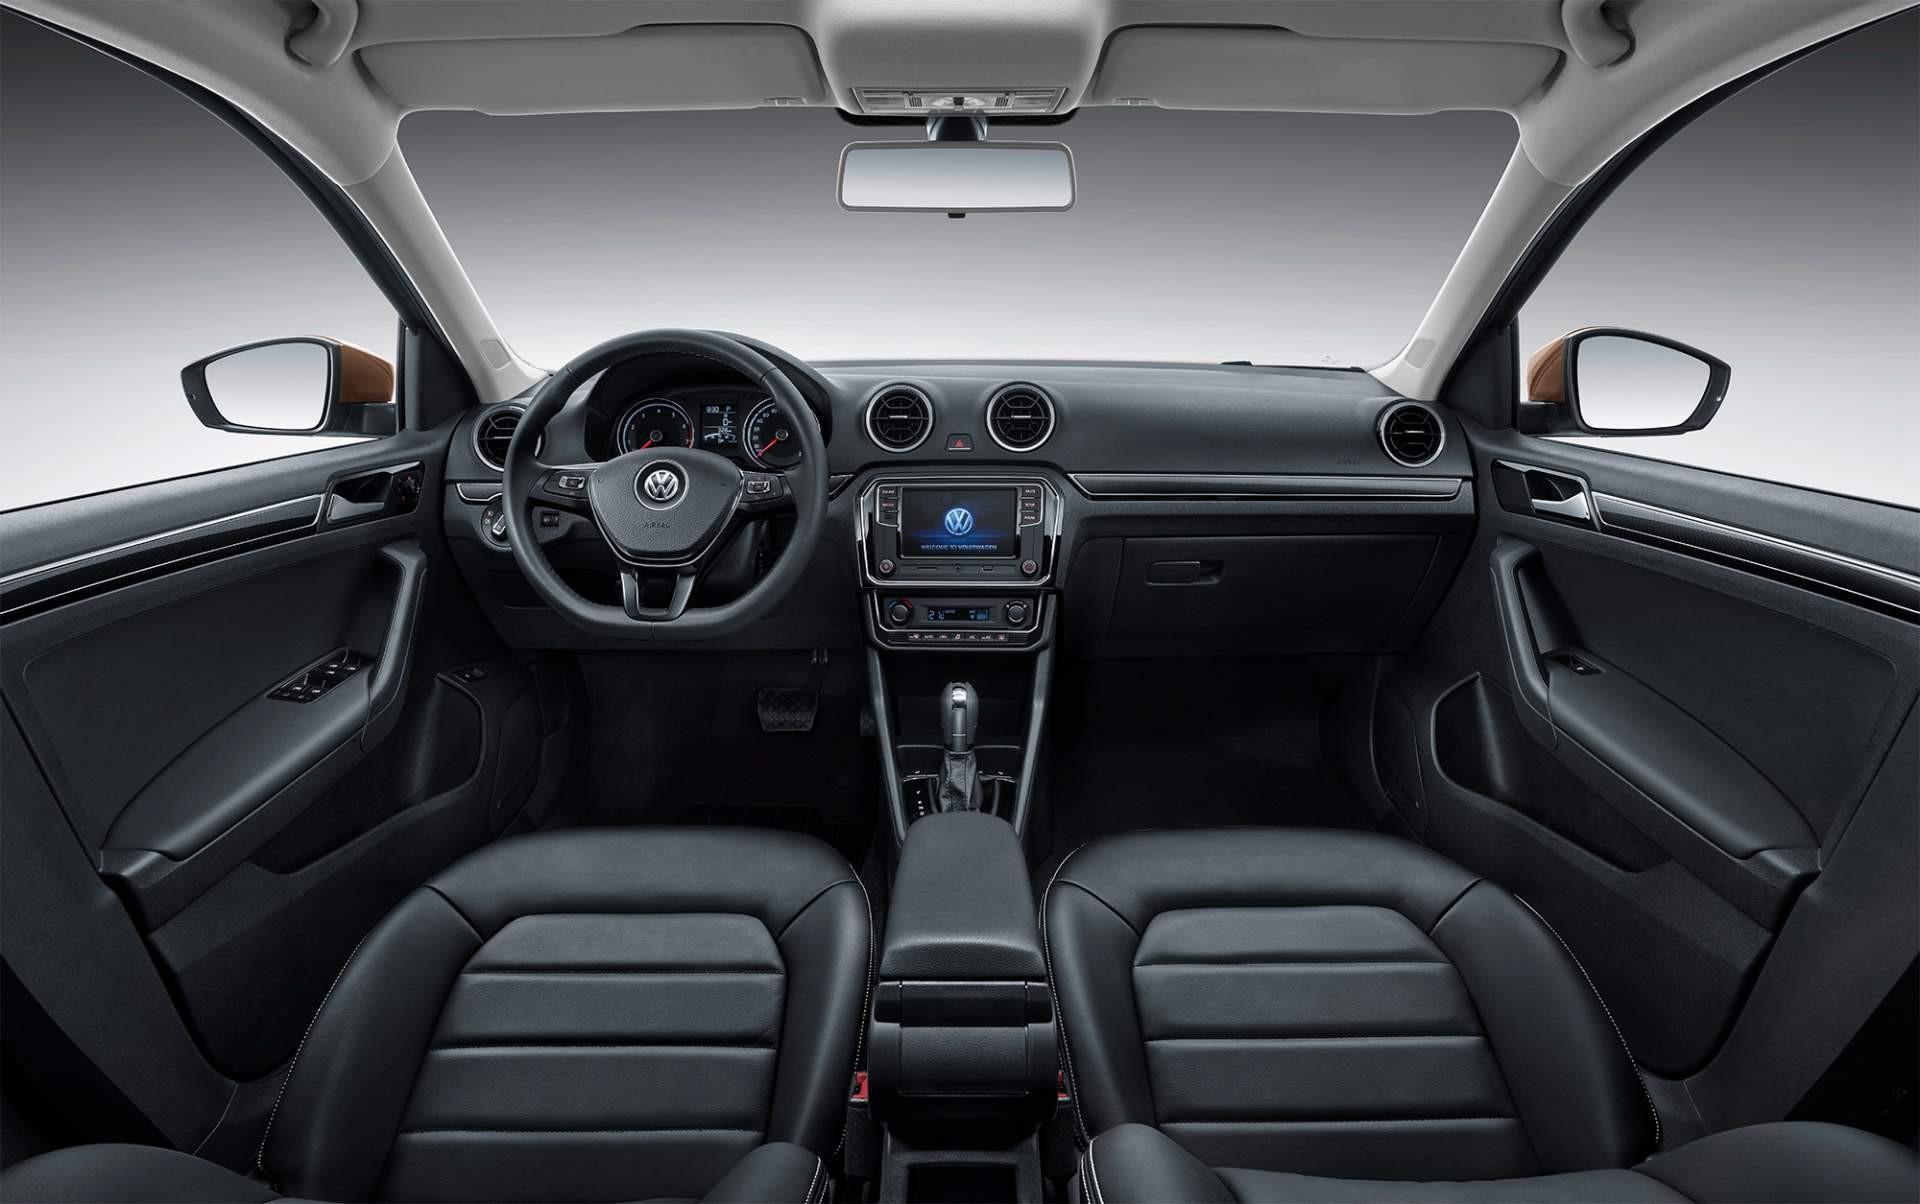 Jetta станет бюджетным брендом VW в Китае 3